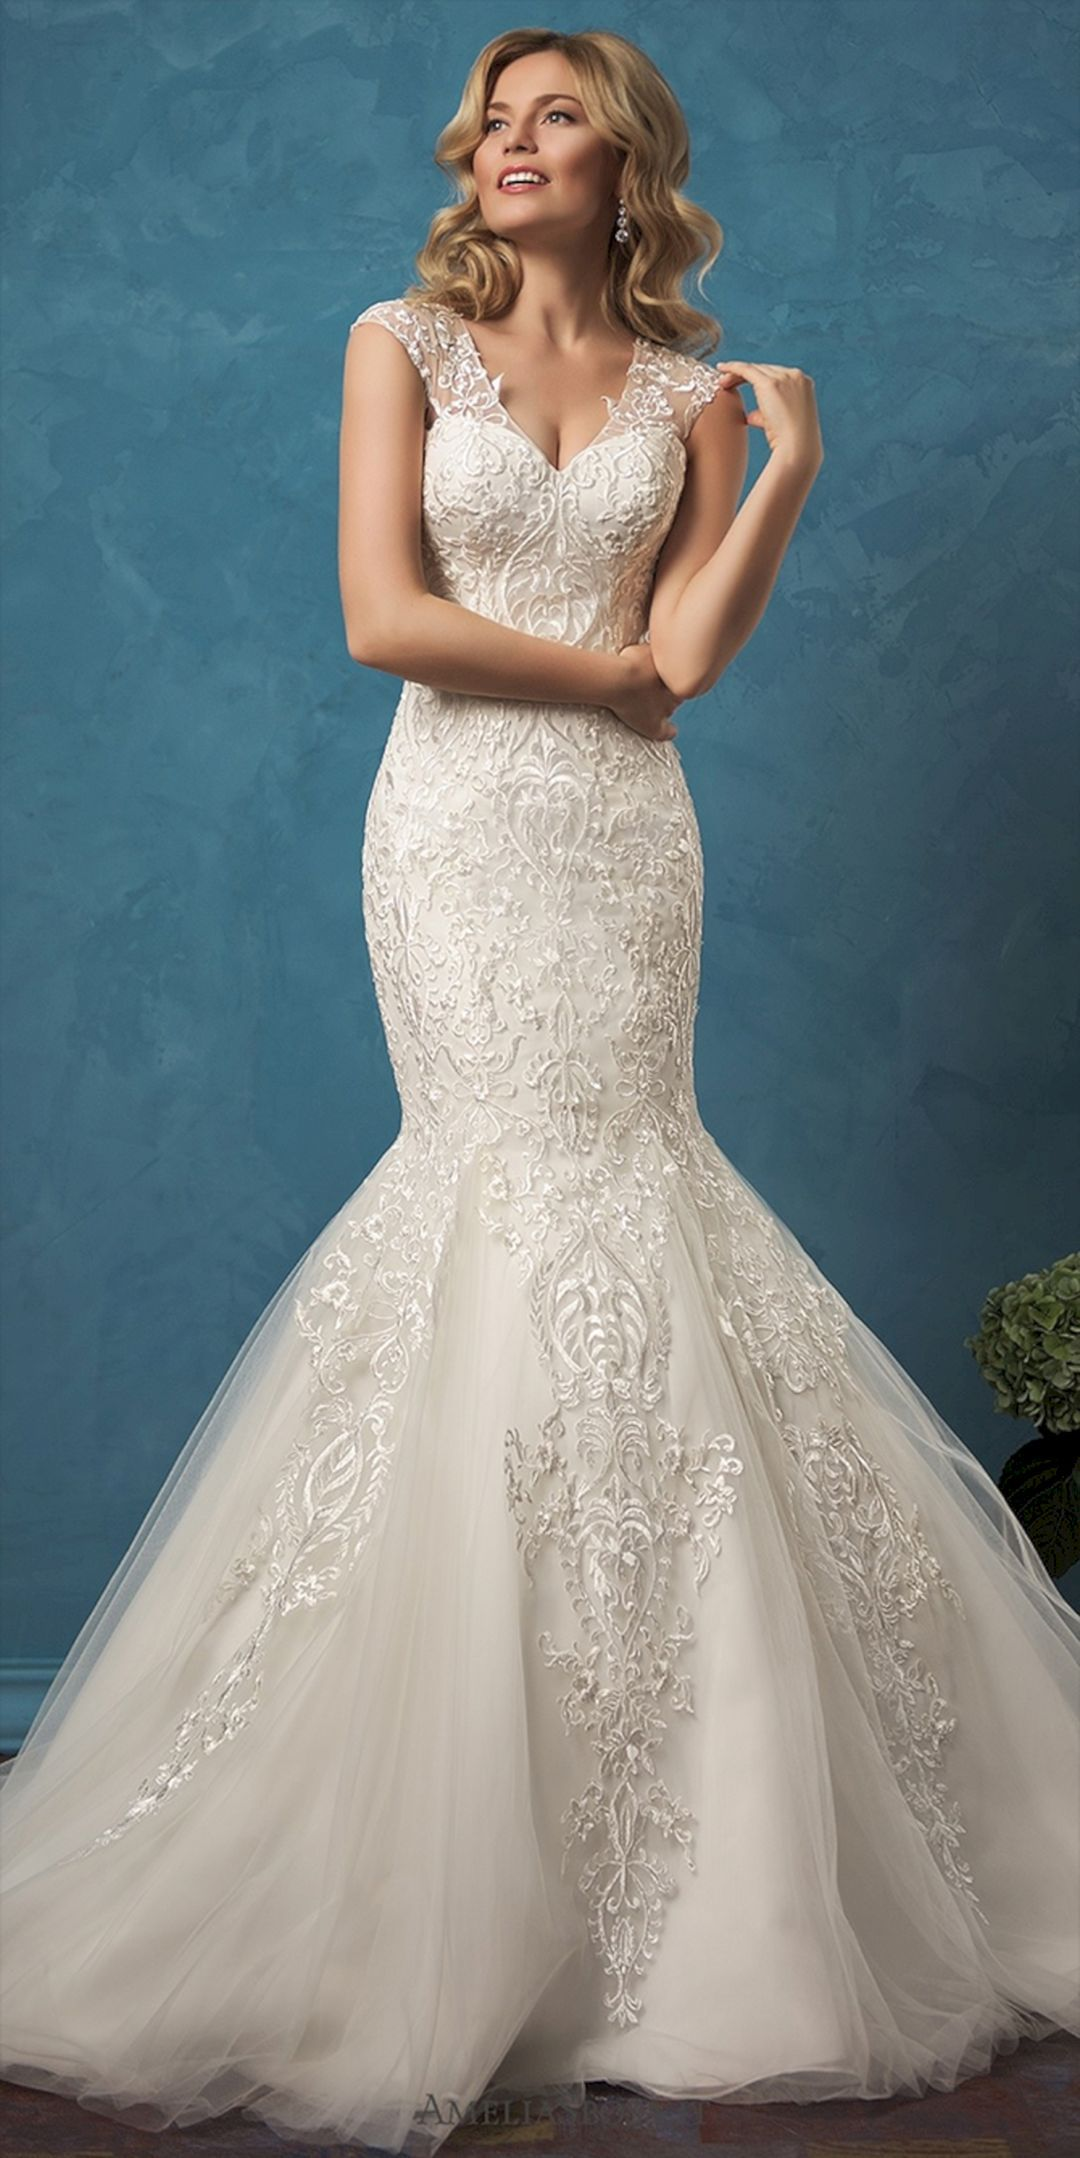 20+ Exclusive Amelia Sposa Wedding Dress Collections | Amelia sposa ...